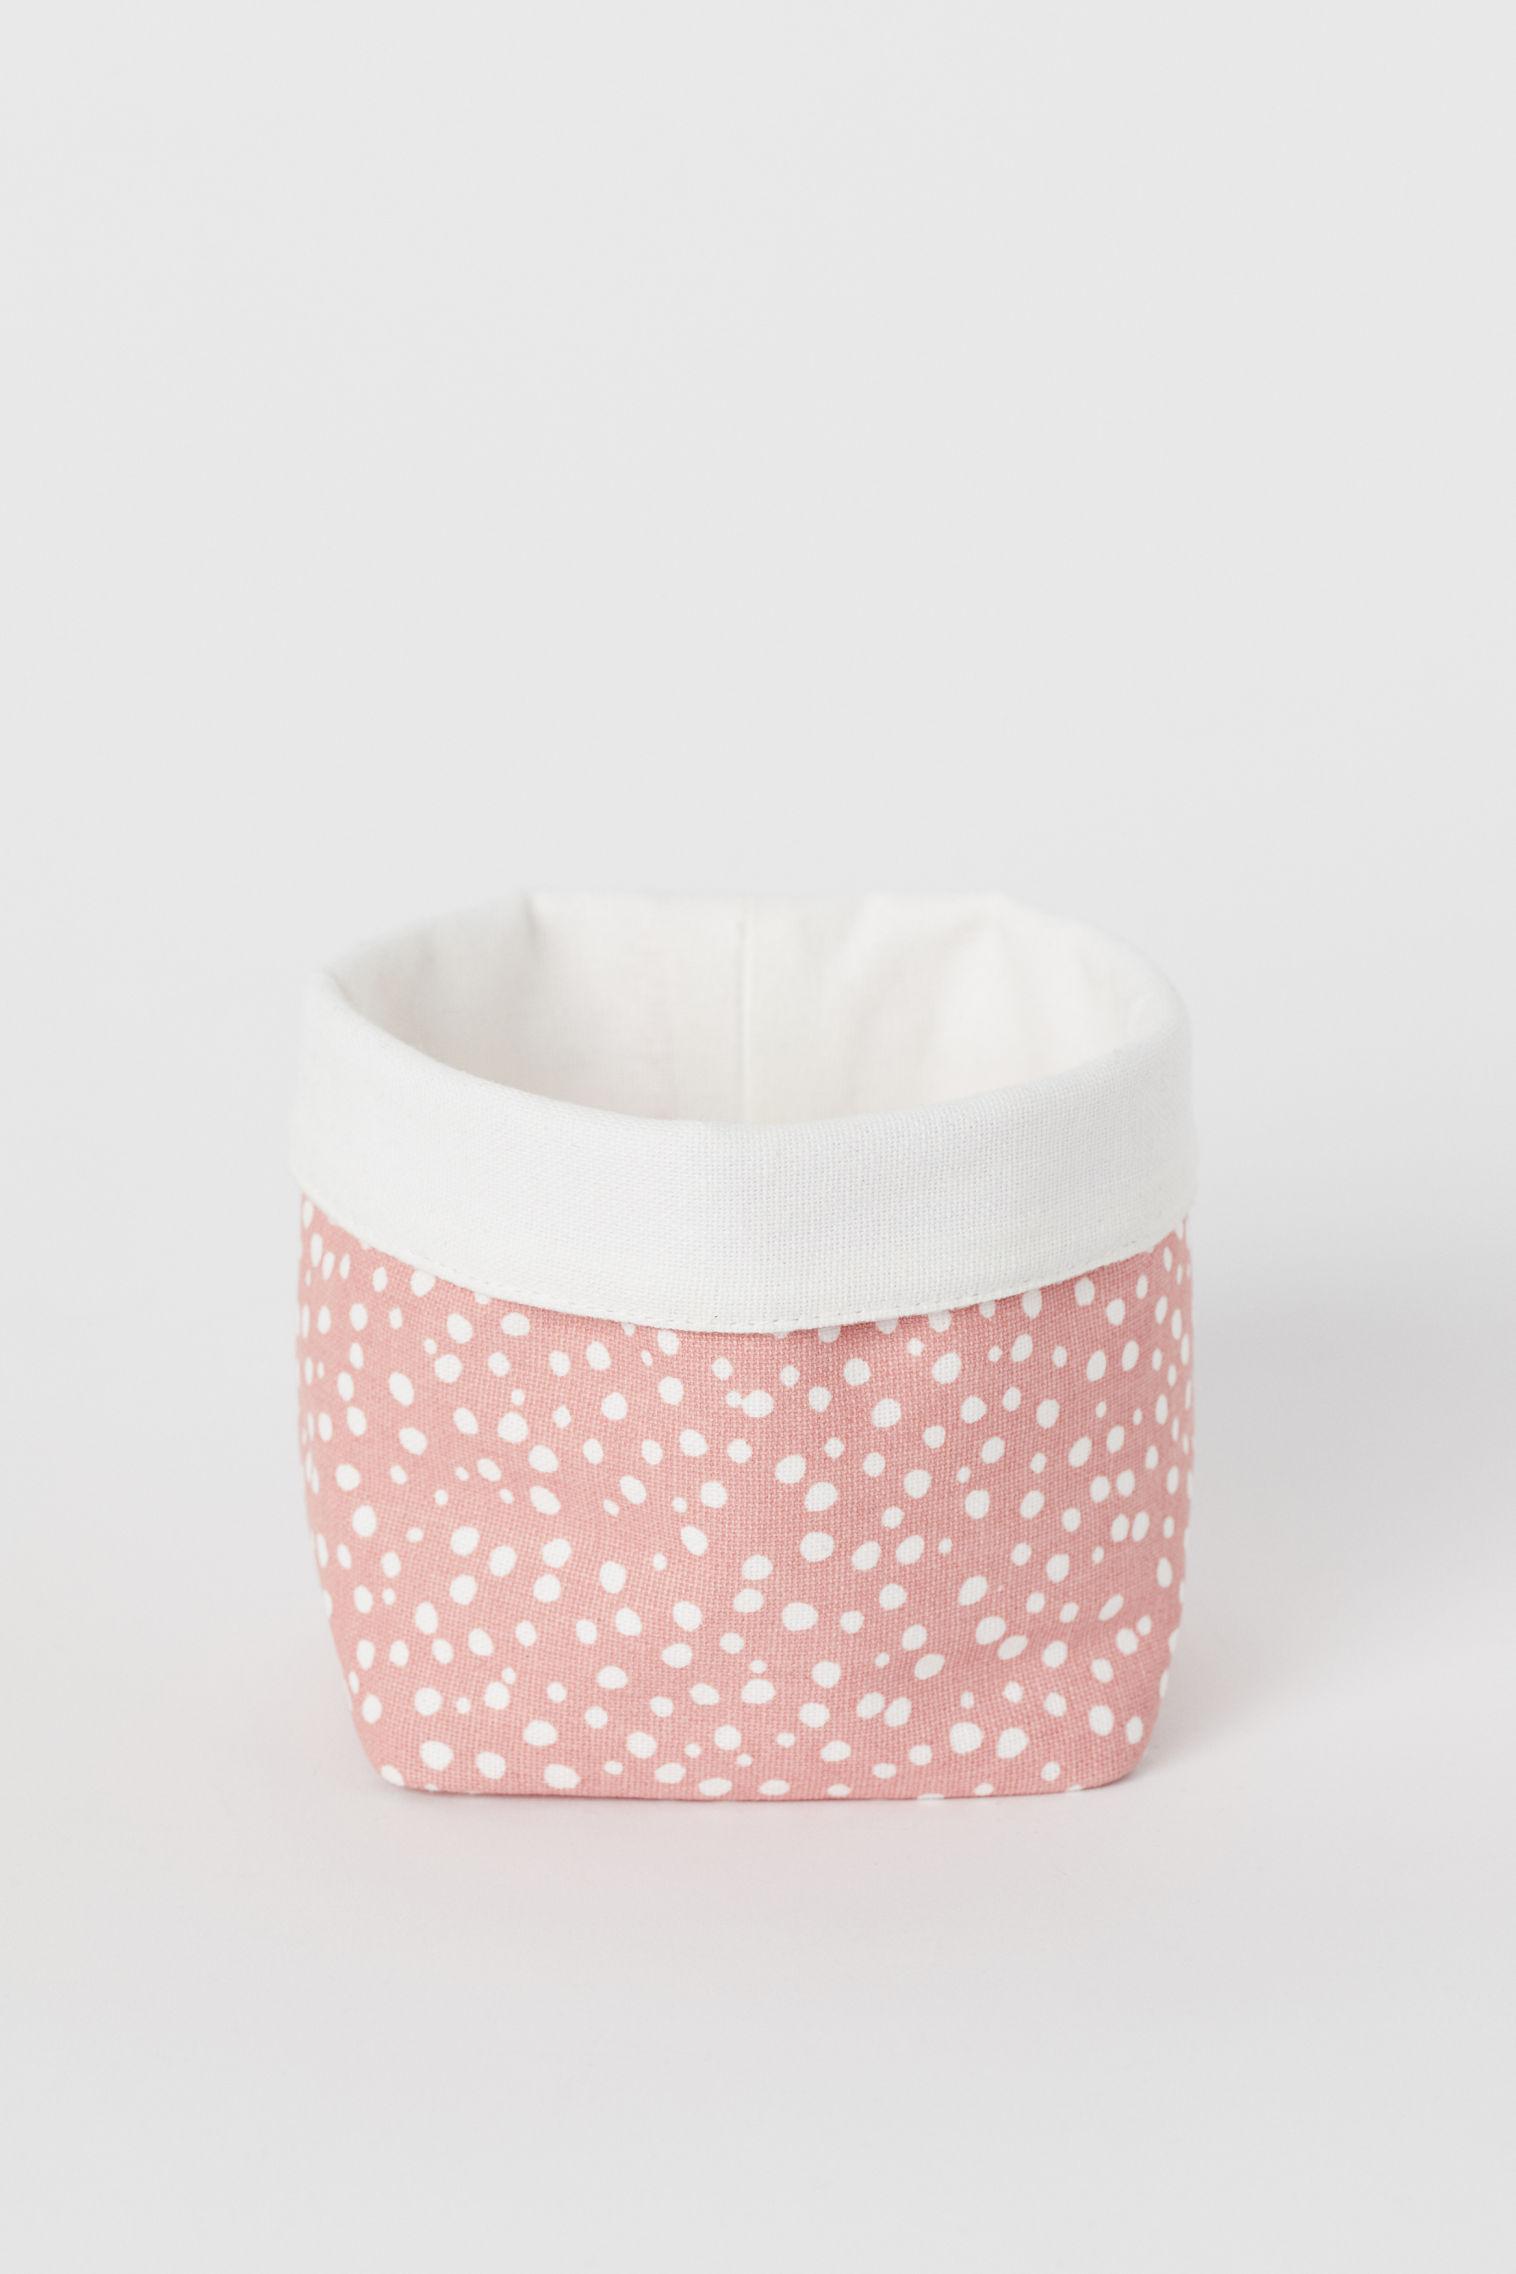 4d51158e5 Small canvas storage basket